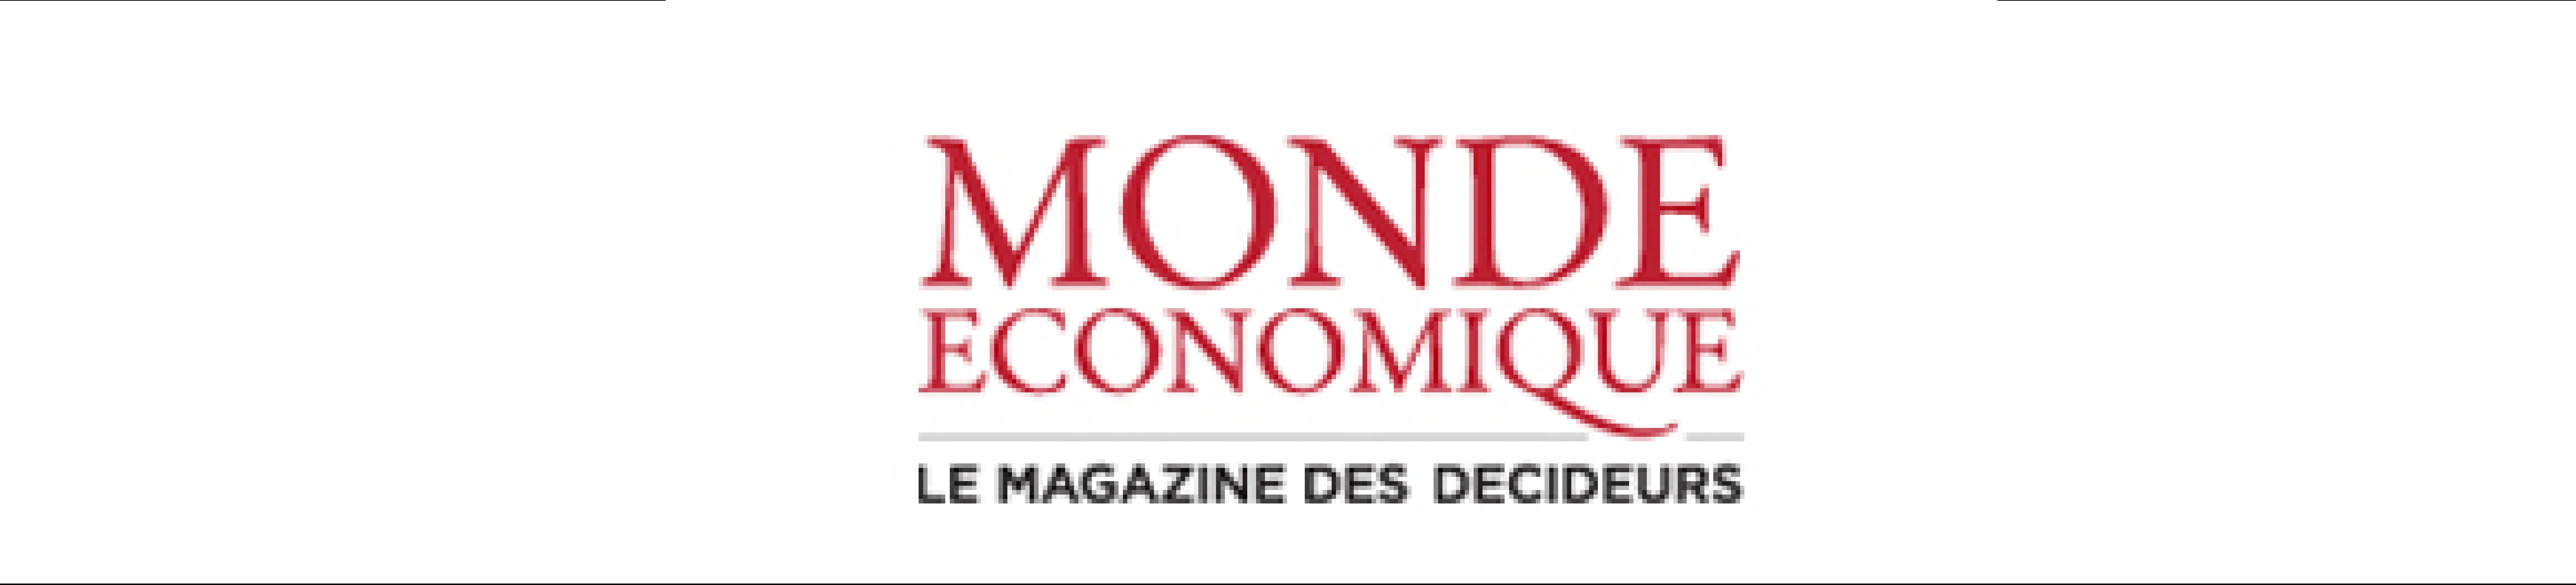 monde_economique